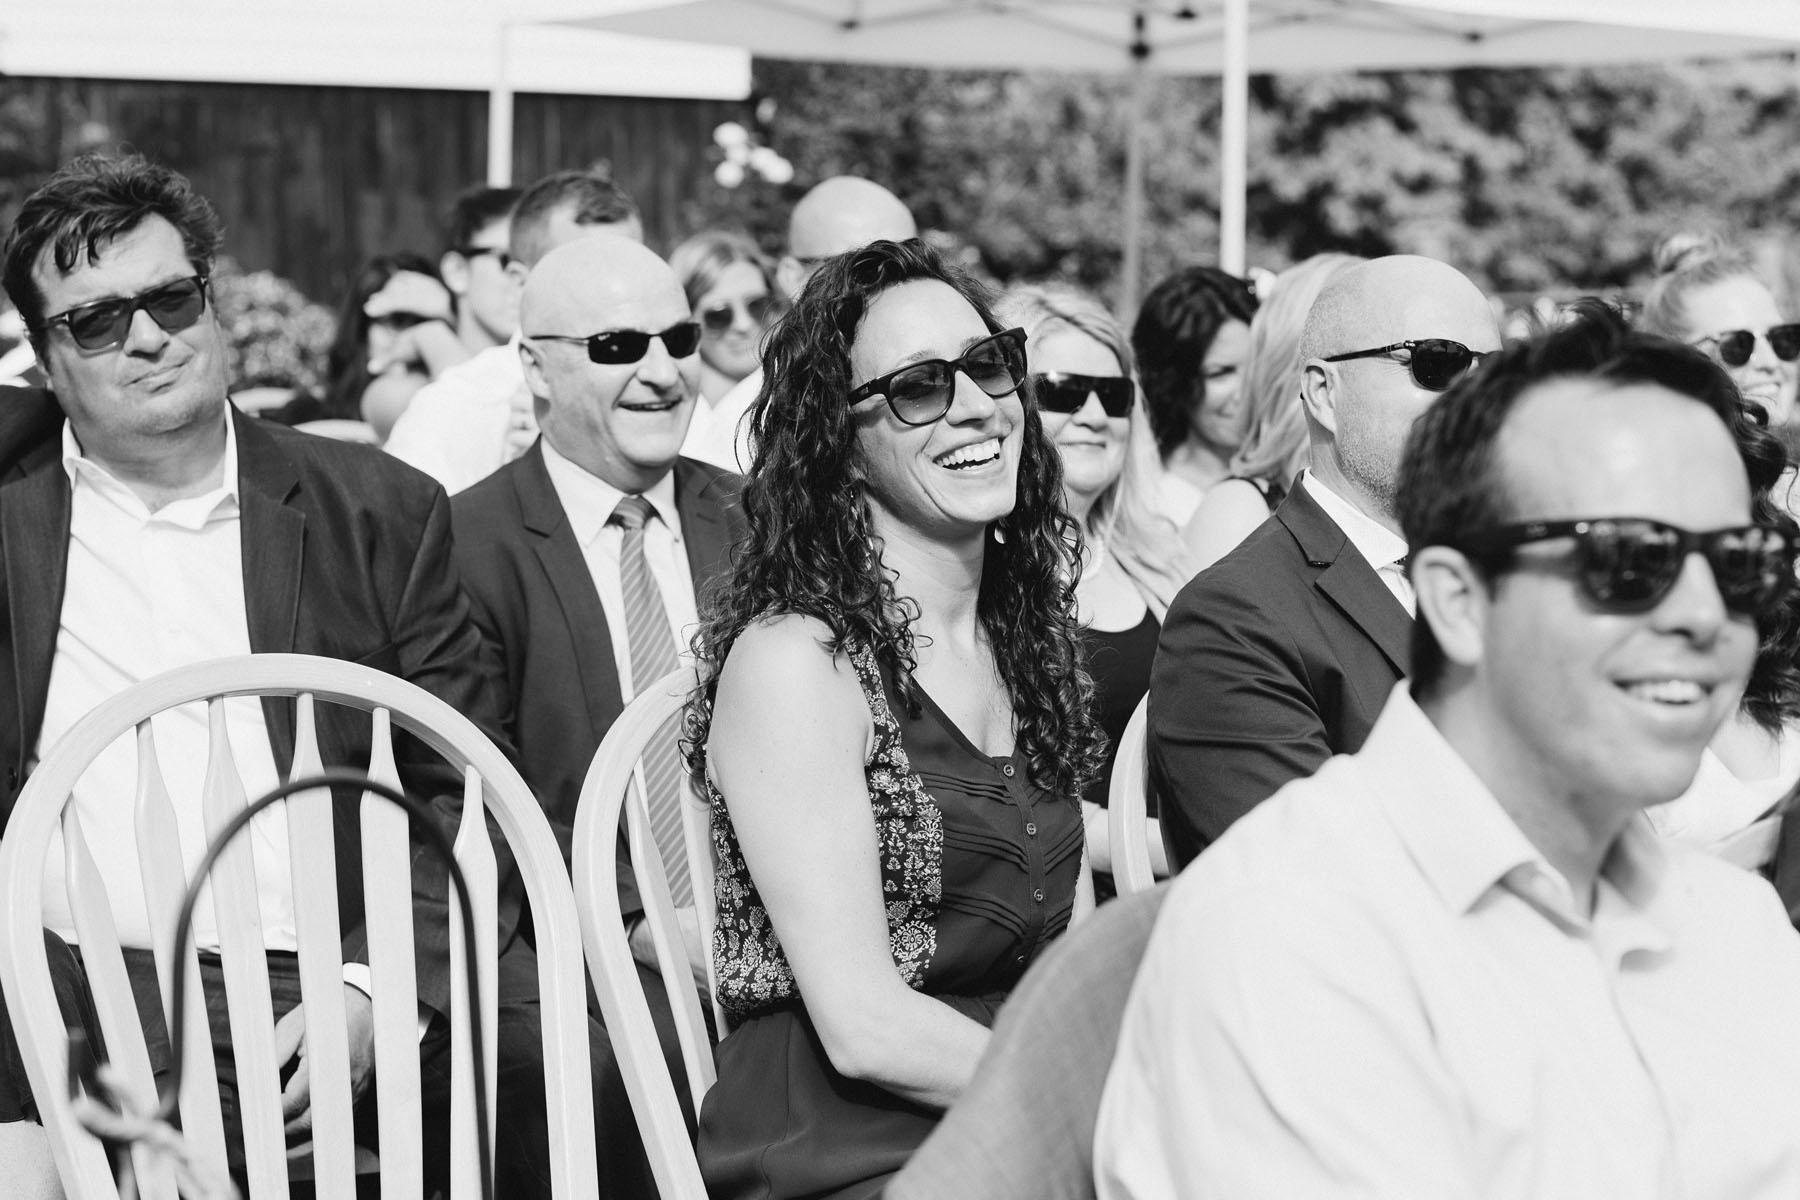 thetis-island-wedding-photographer-rp-rn-078.jpg